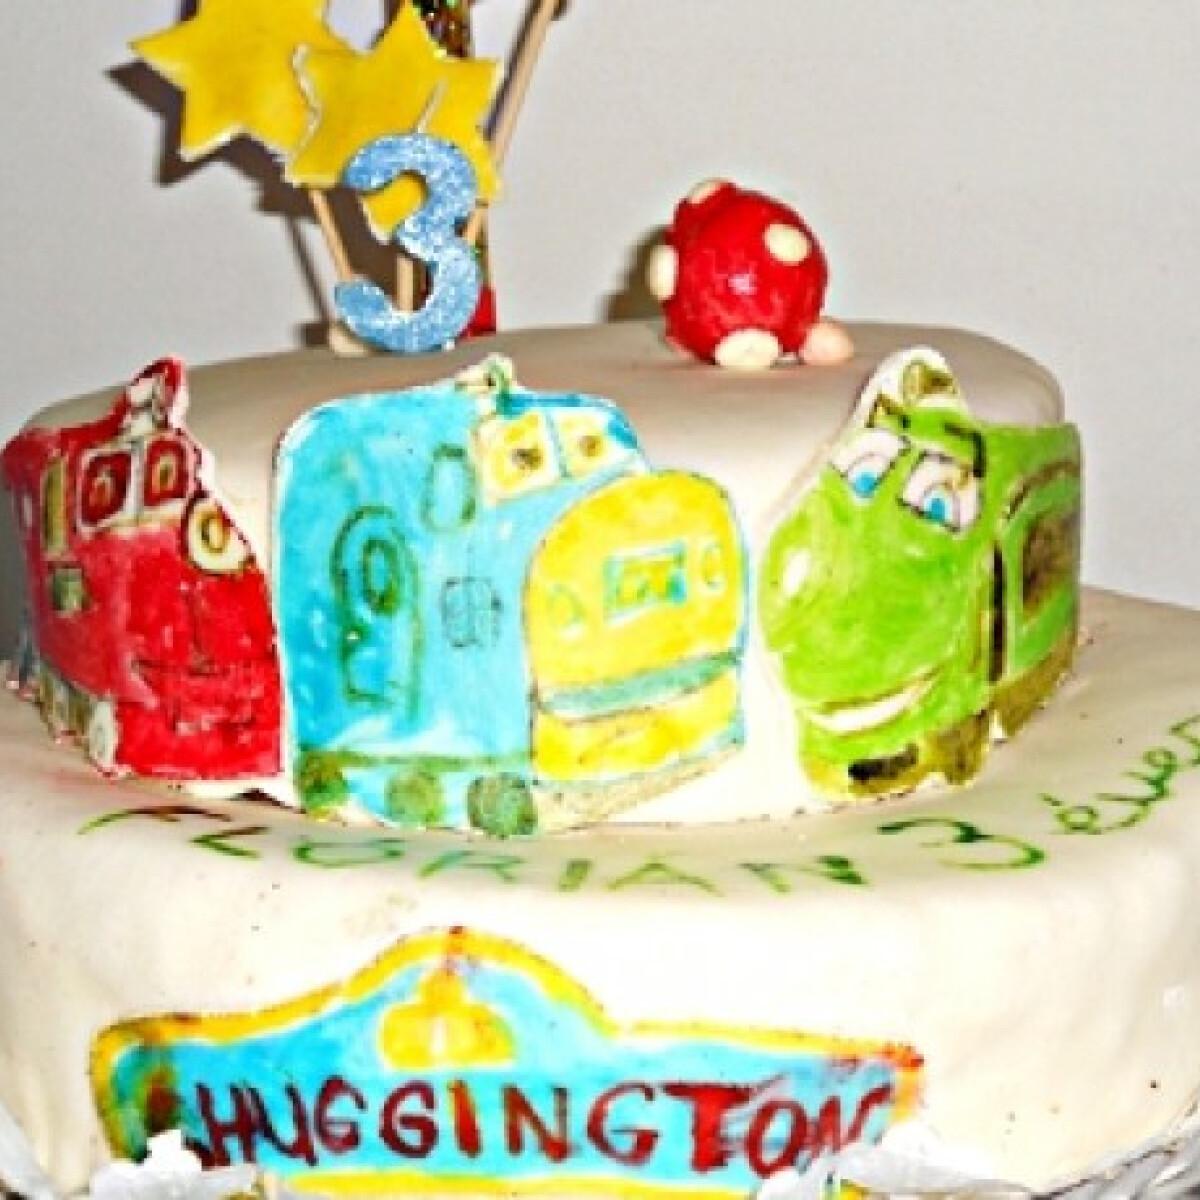 Ezen a képen: Chuggington torta